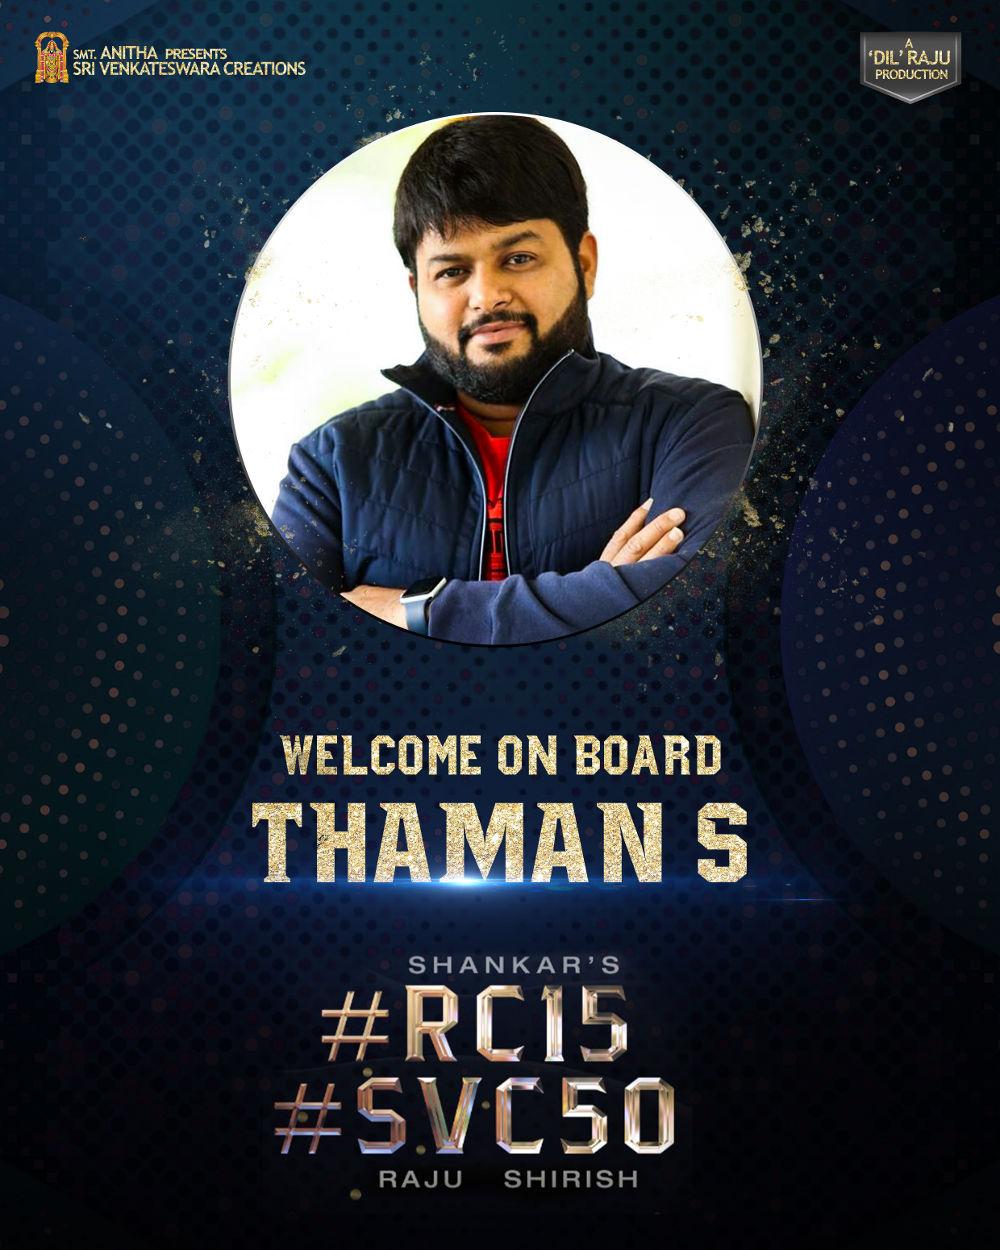 Thaman on board for Shankar - Ram Charan movie